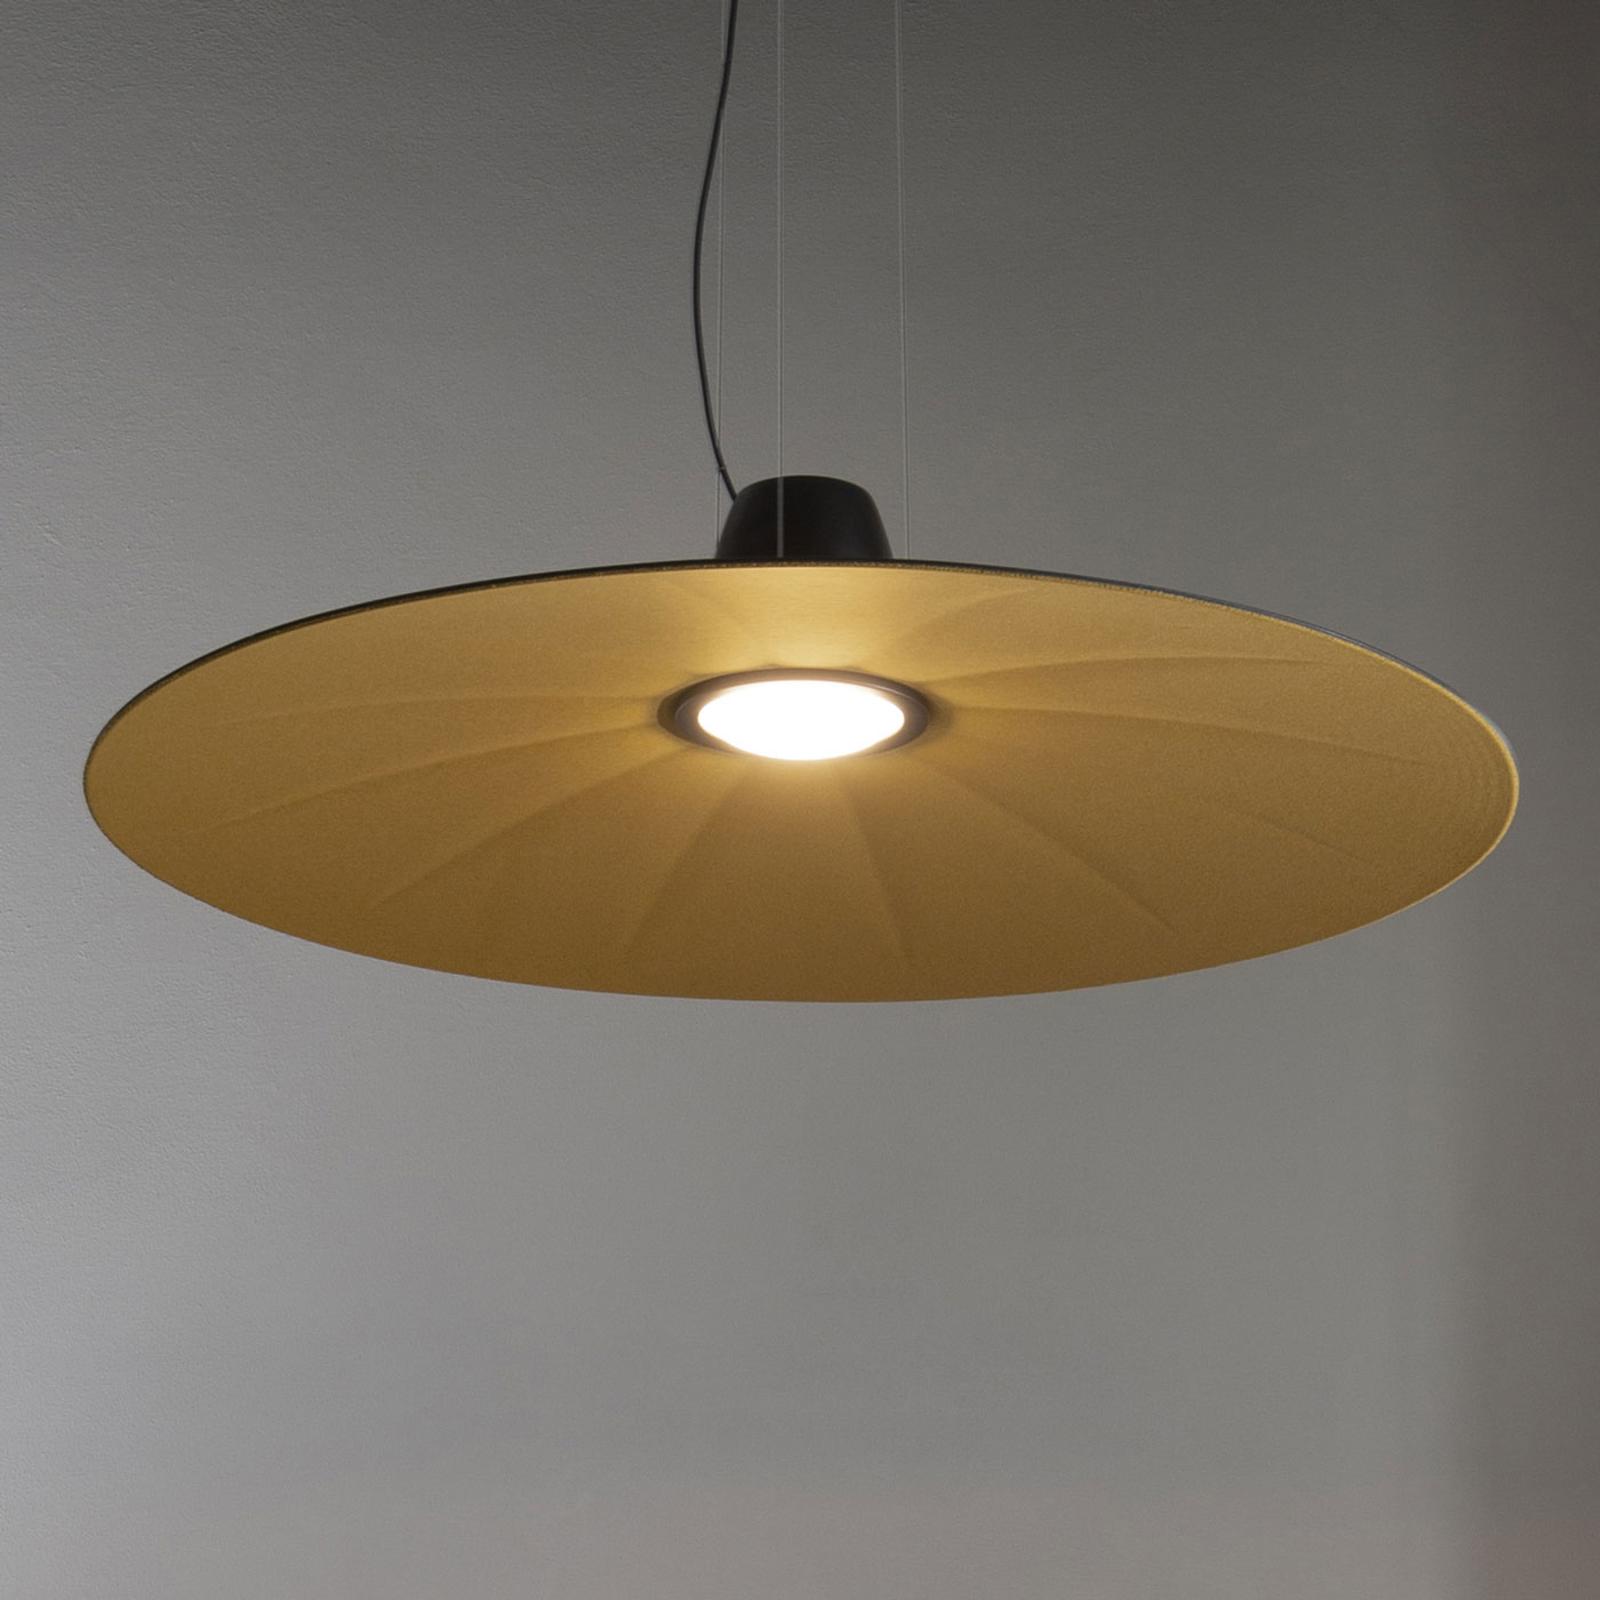 Martinelli Luce Lent LED-hänglampa, gul